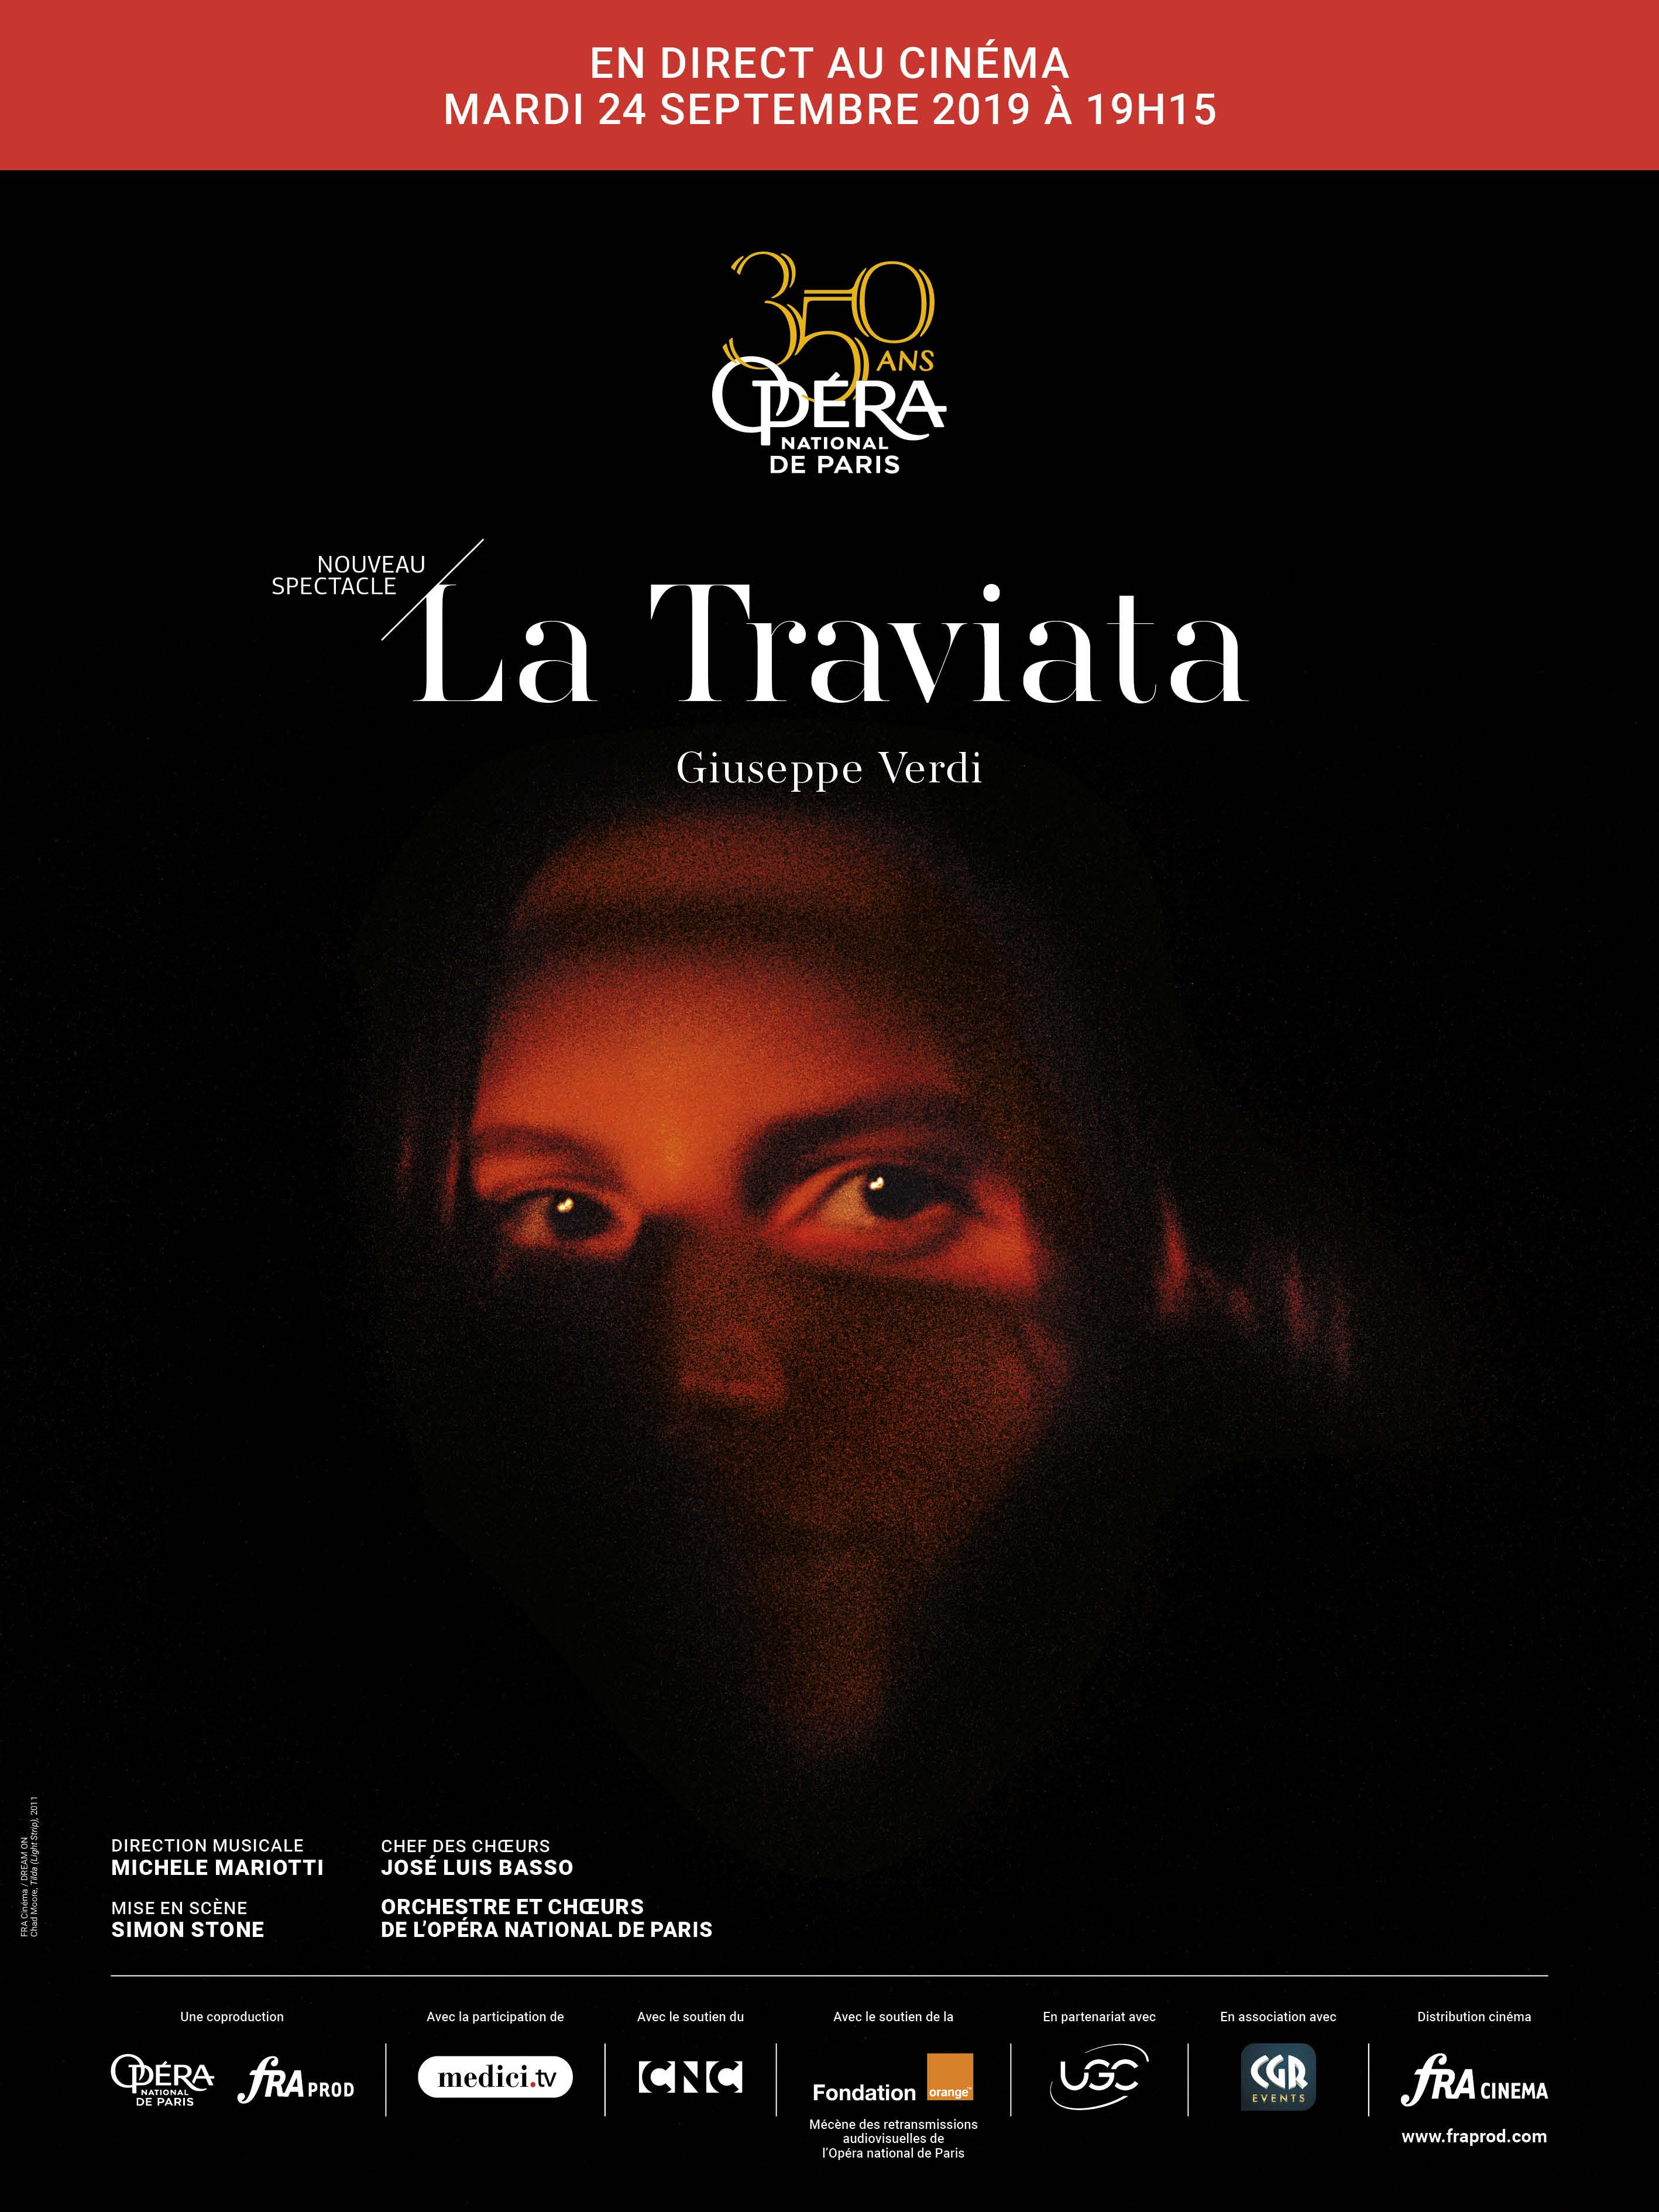 La Traviata (Opéra de Paris-FRA Cinéma)